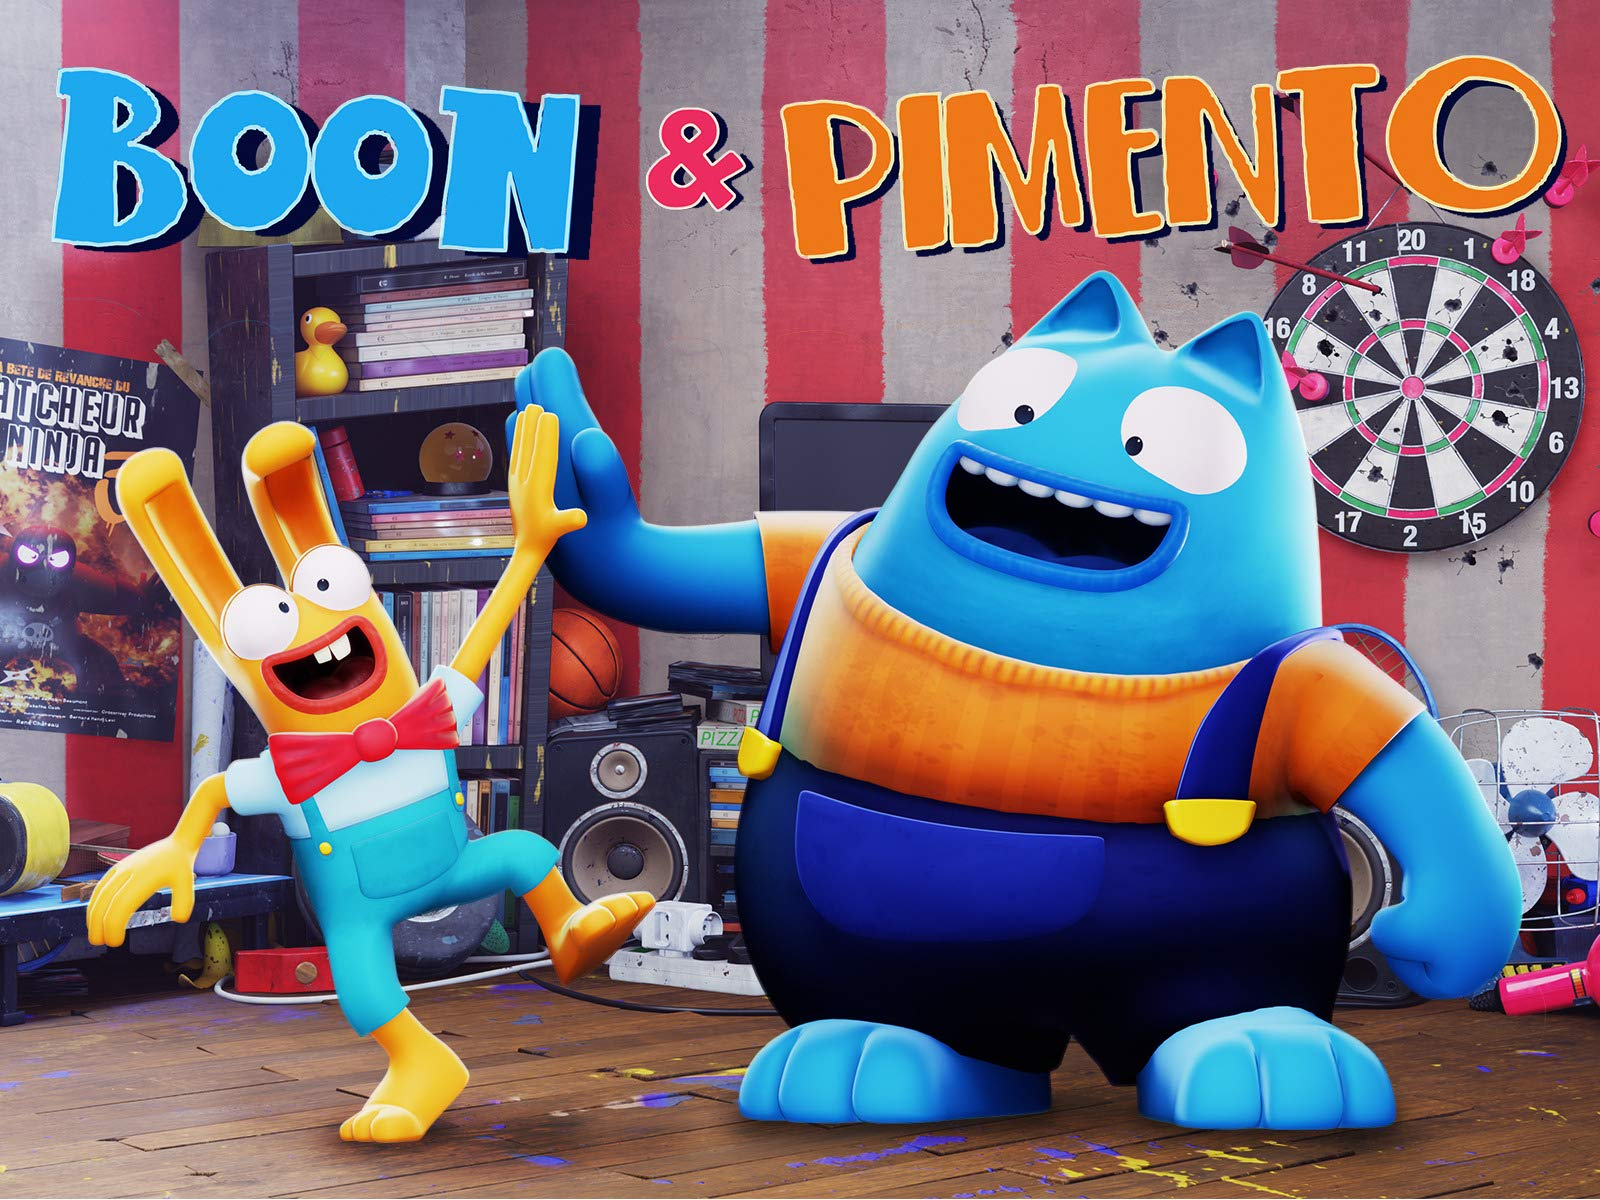 Boon & Pimento on Amazon Prime Video UK